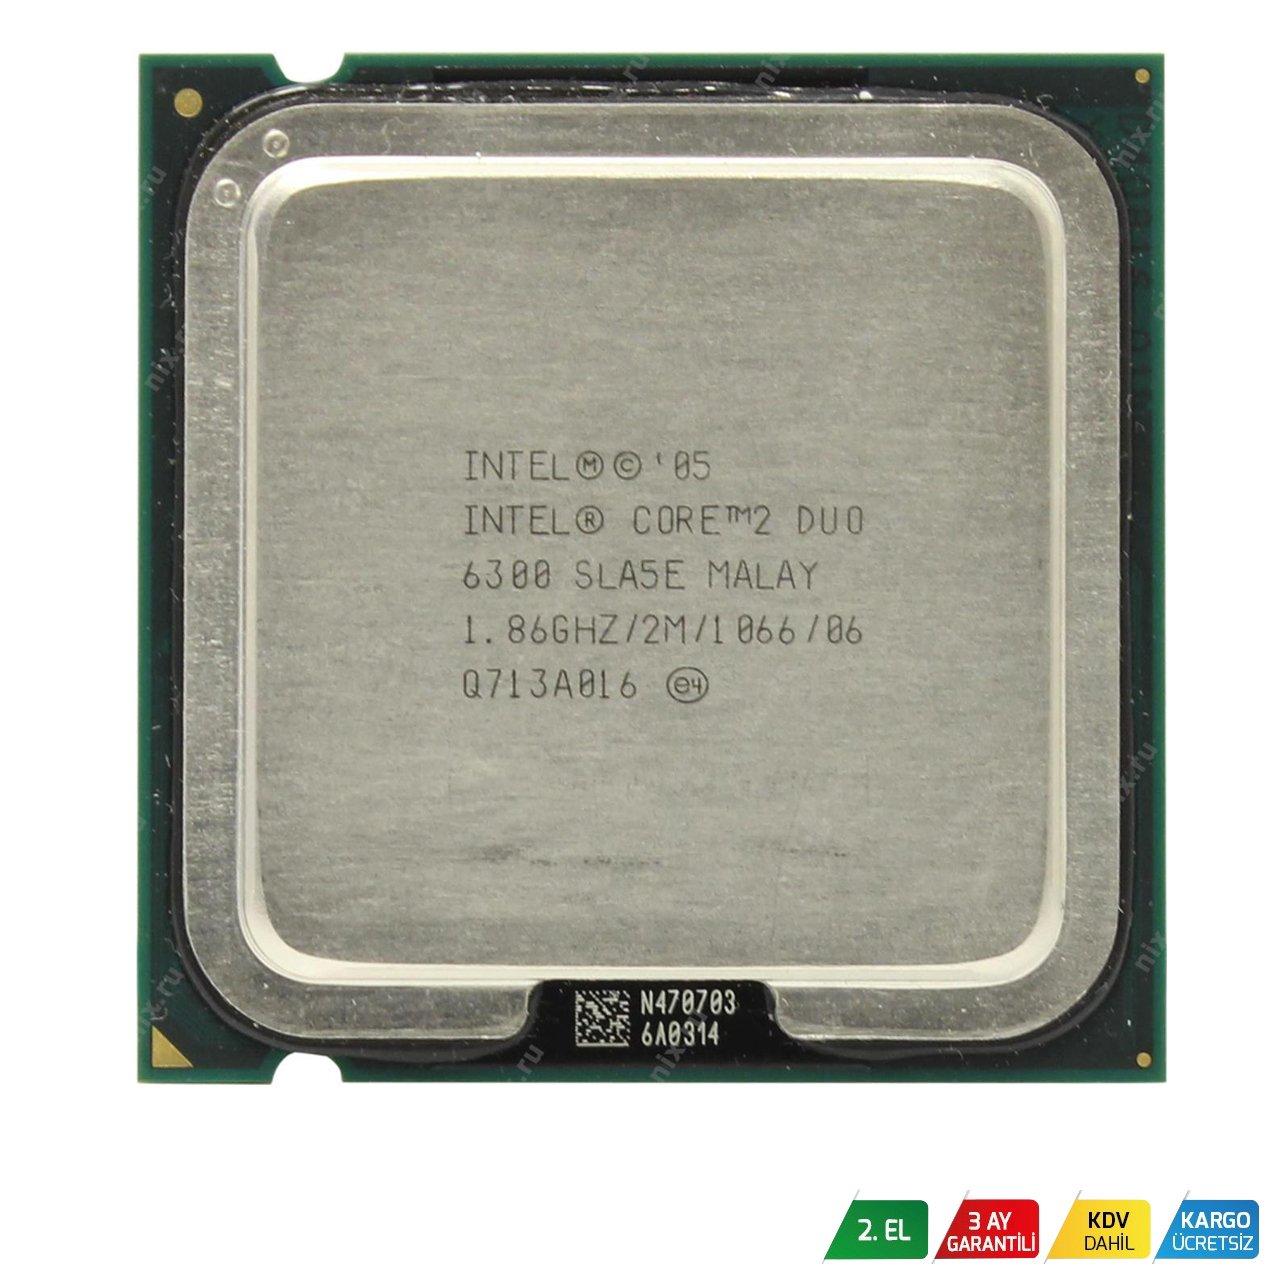 ad4415979feb2 İntel Core 2 Duo E6300 İşlemci : Atom Bilişim